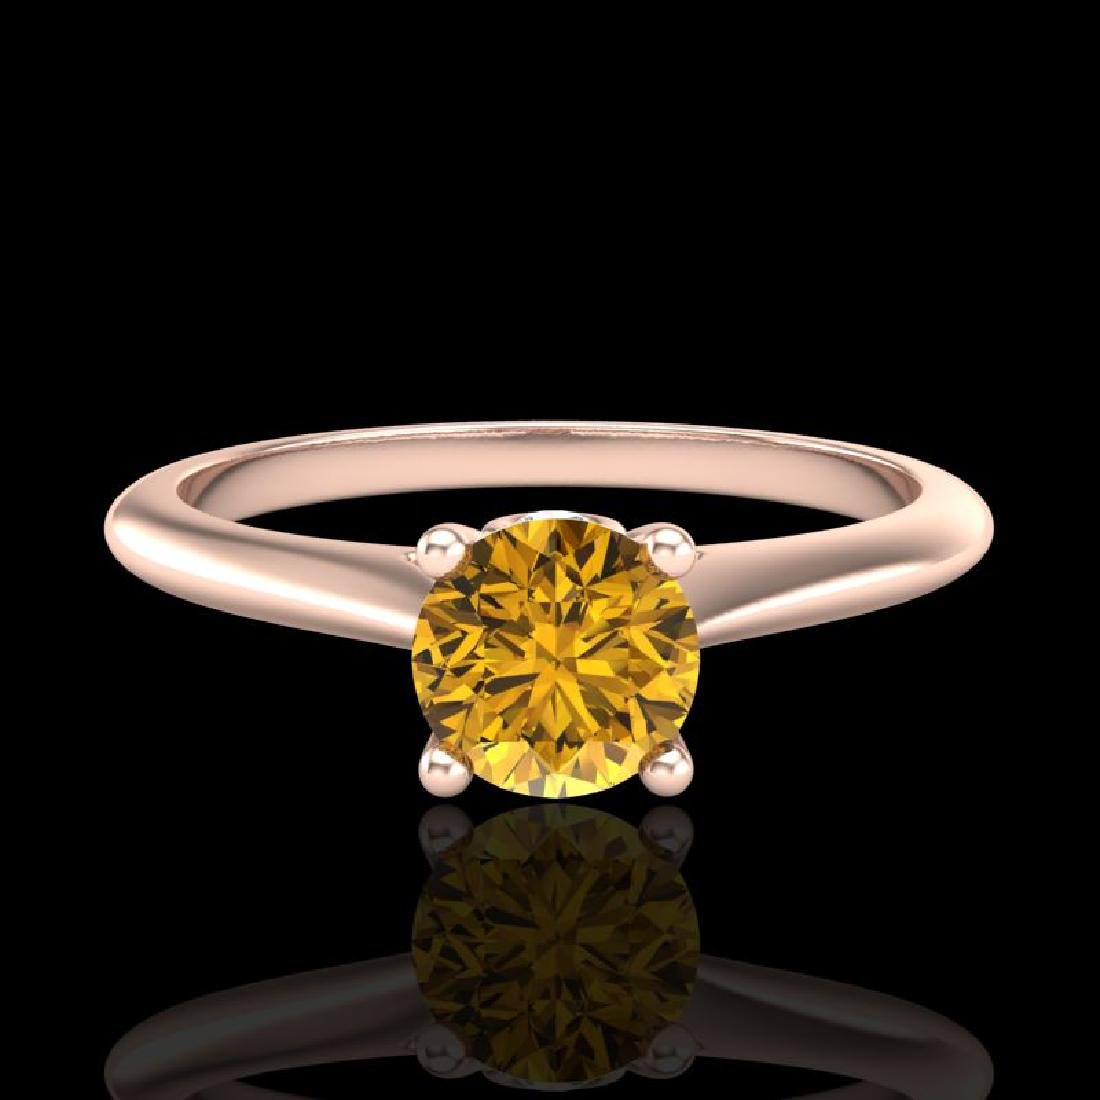 0.56 CTW Intense Fancy Yellow Diamond Engagement Art - 2